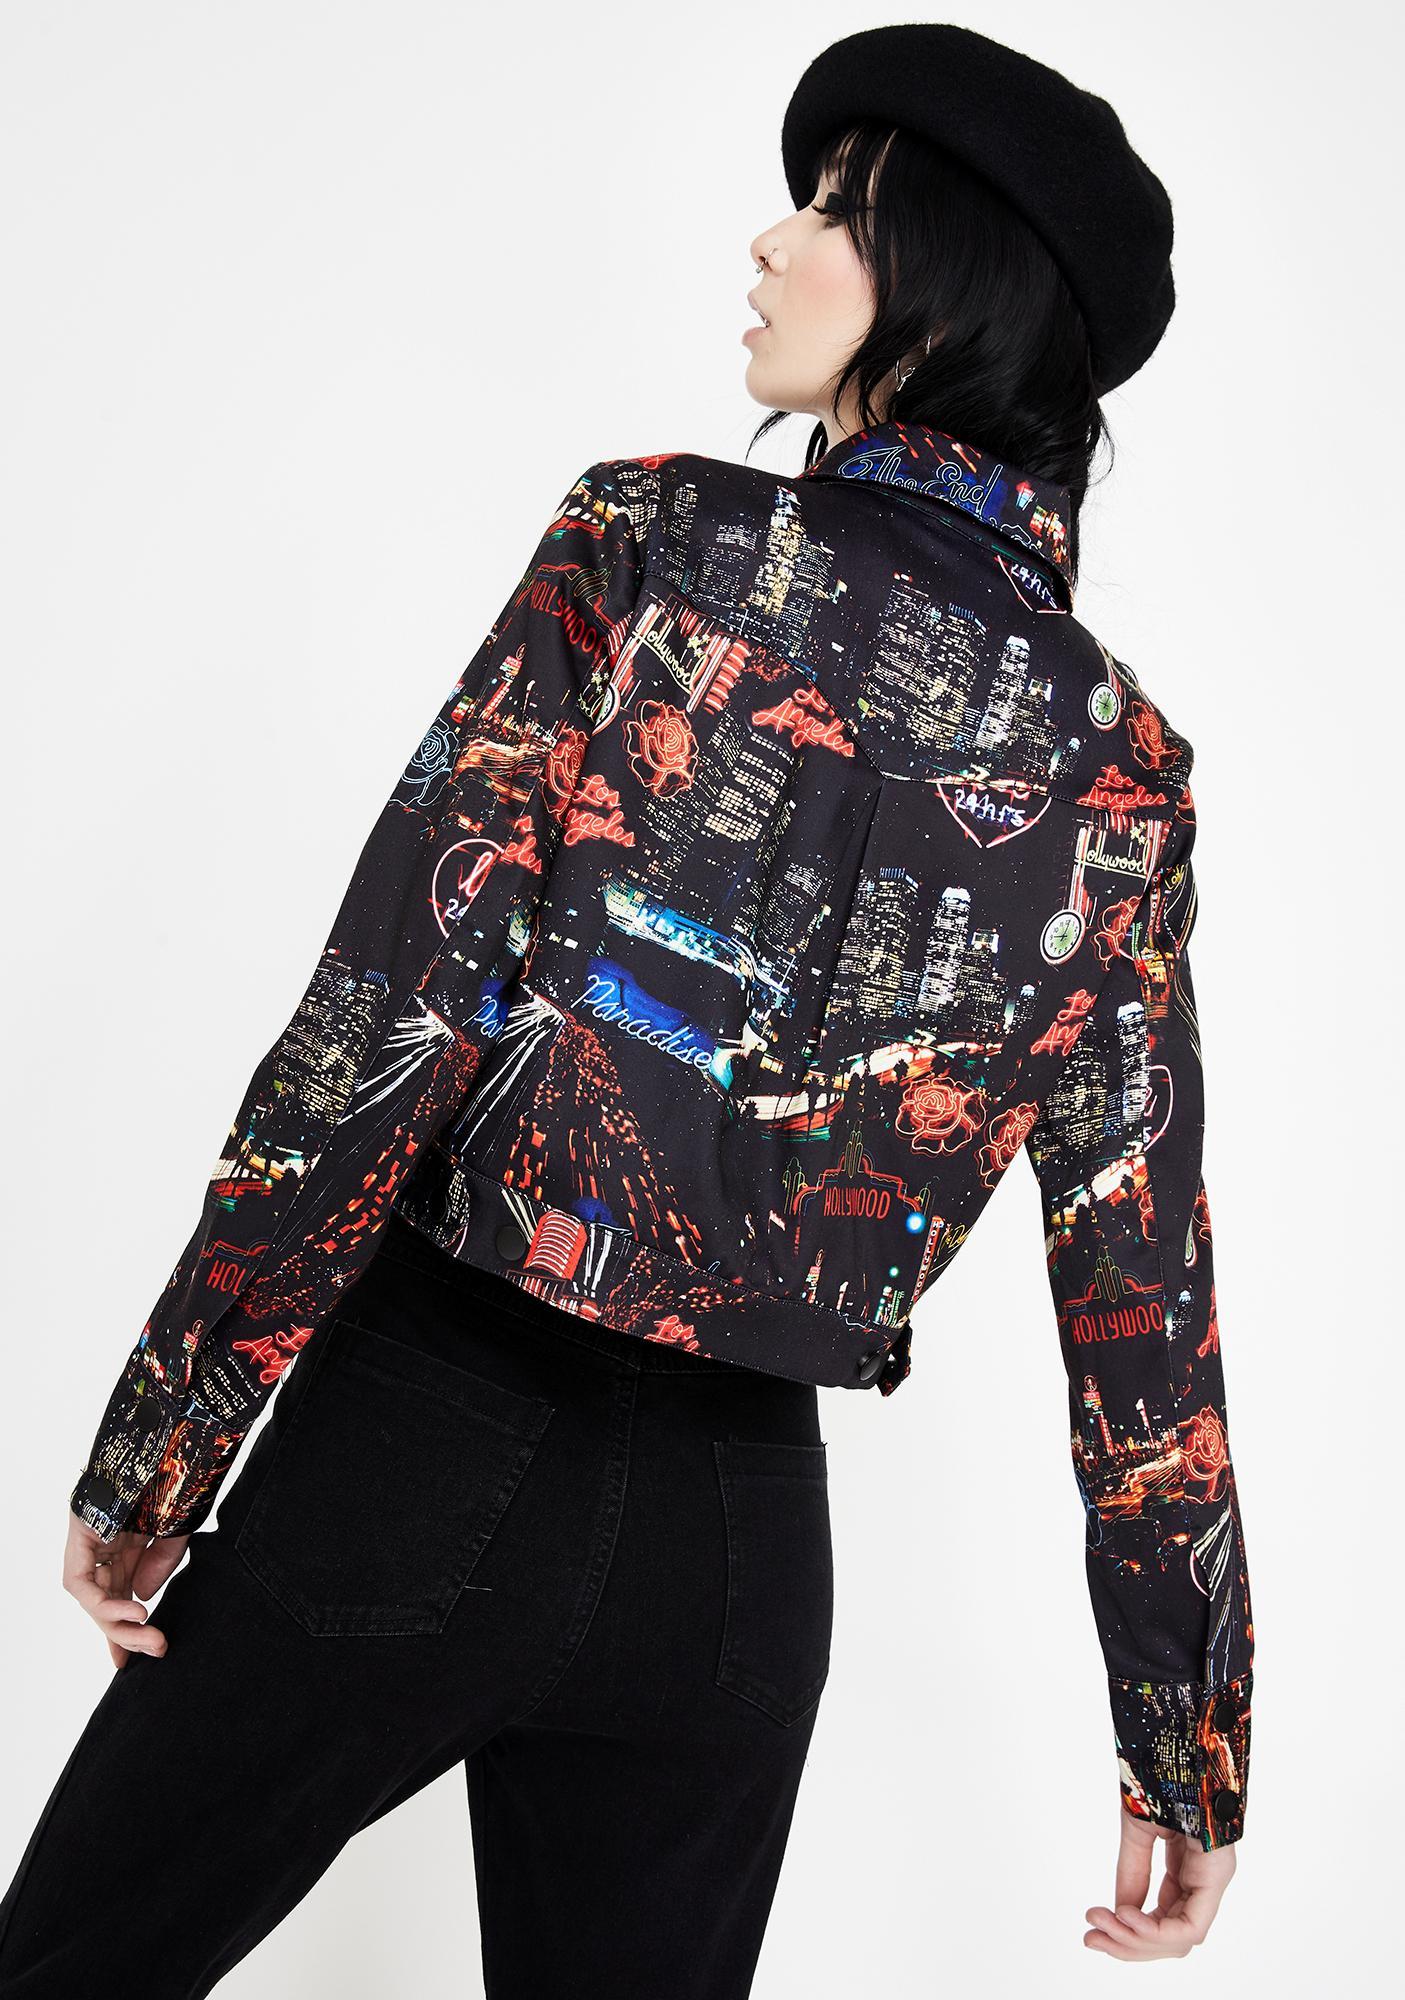 Jawbreaker City Lights Of Paradise Zip Up Jacket